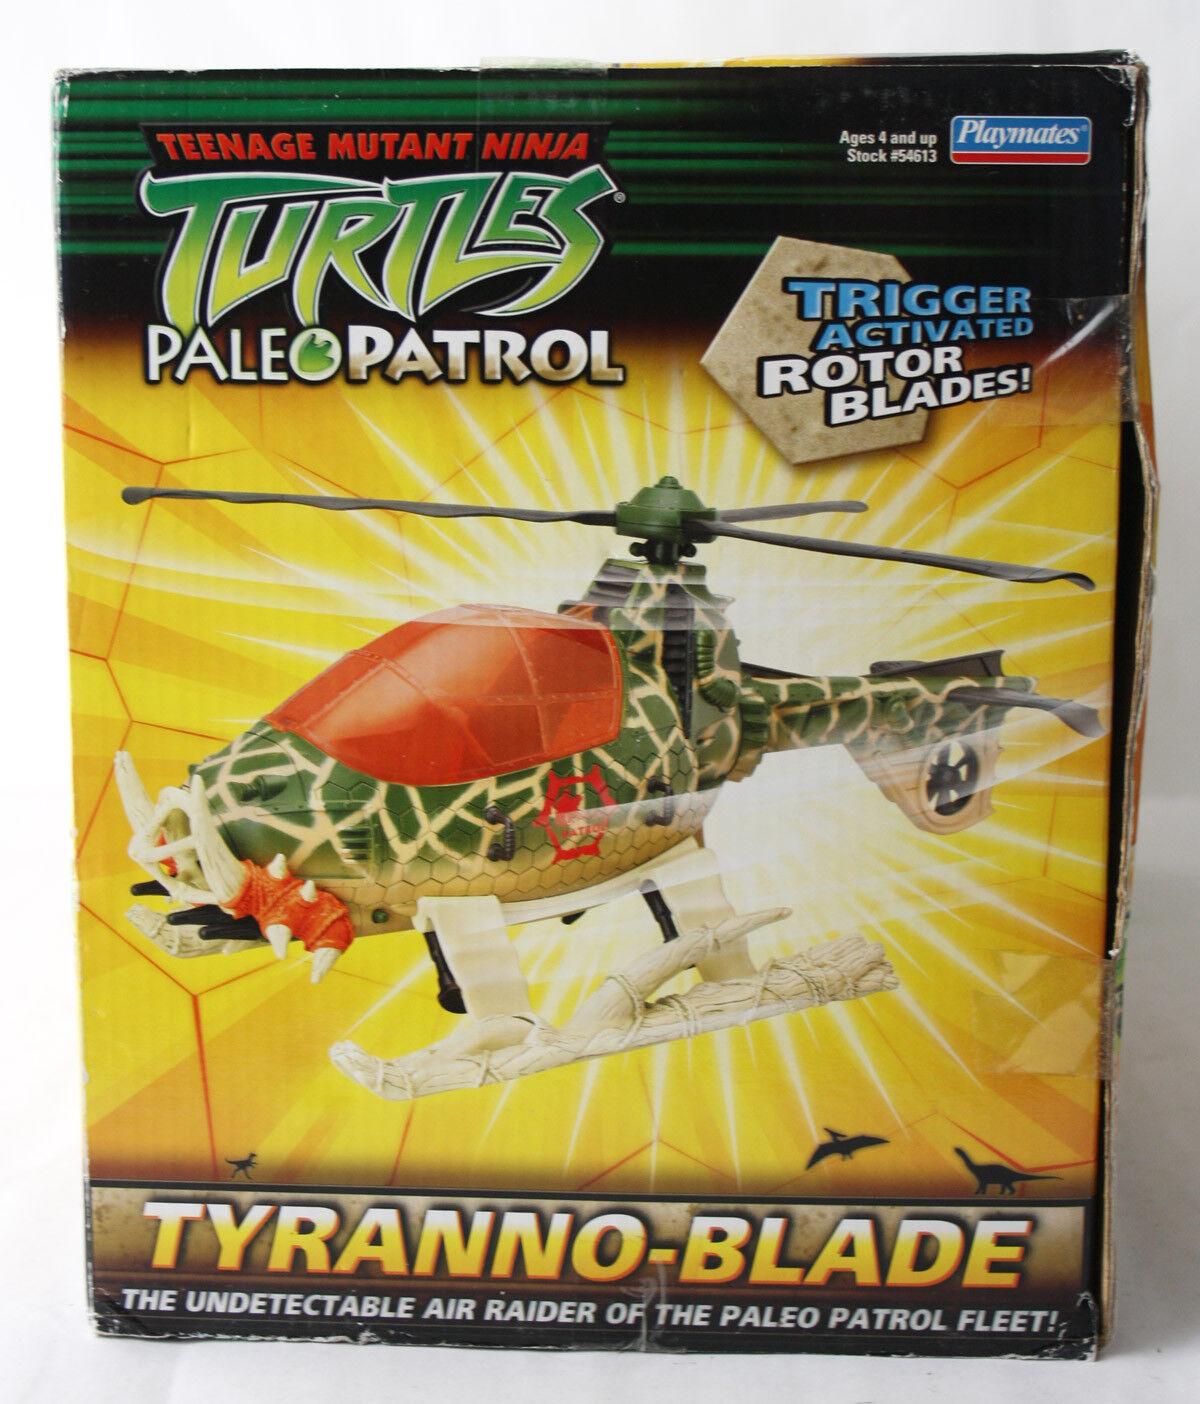 VERY VERY VERY RARE TMNT NINJA TURTLES TYRANNO BLADE HELICOPTER PALEO PATROL NEW   48f91d